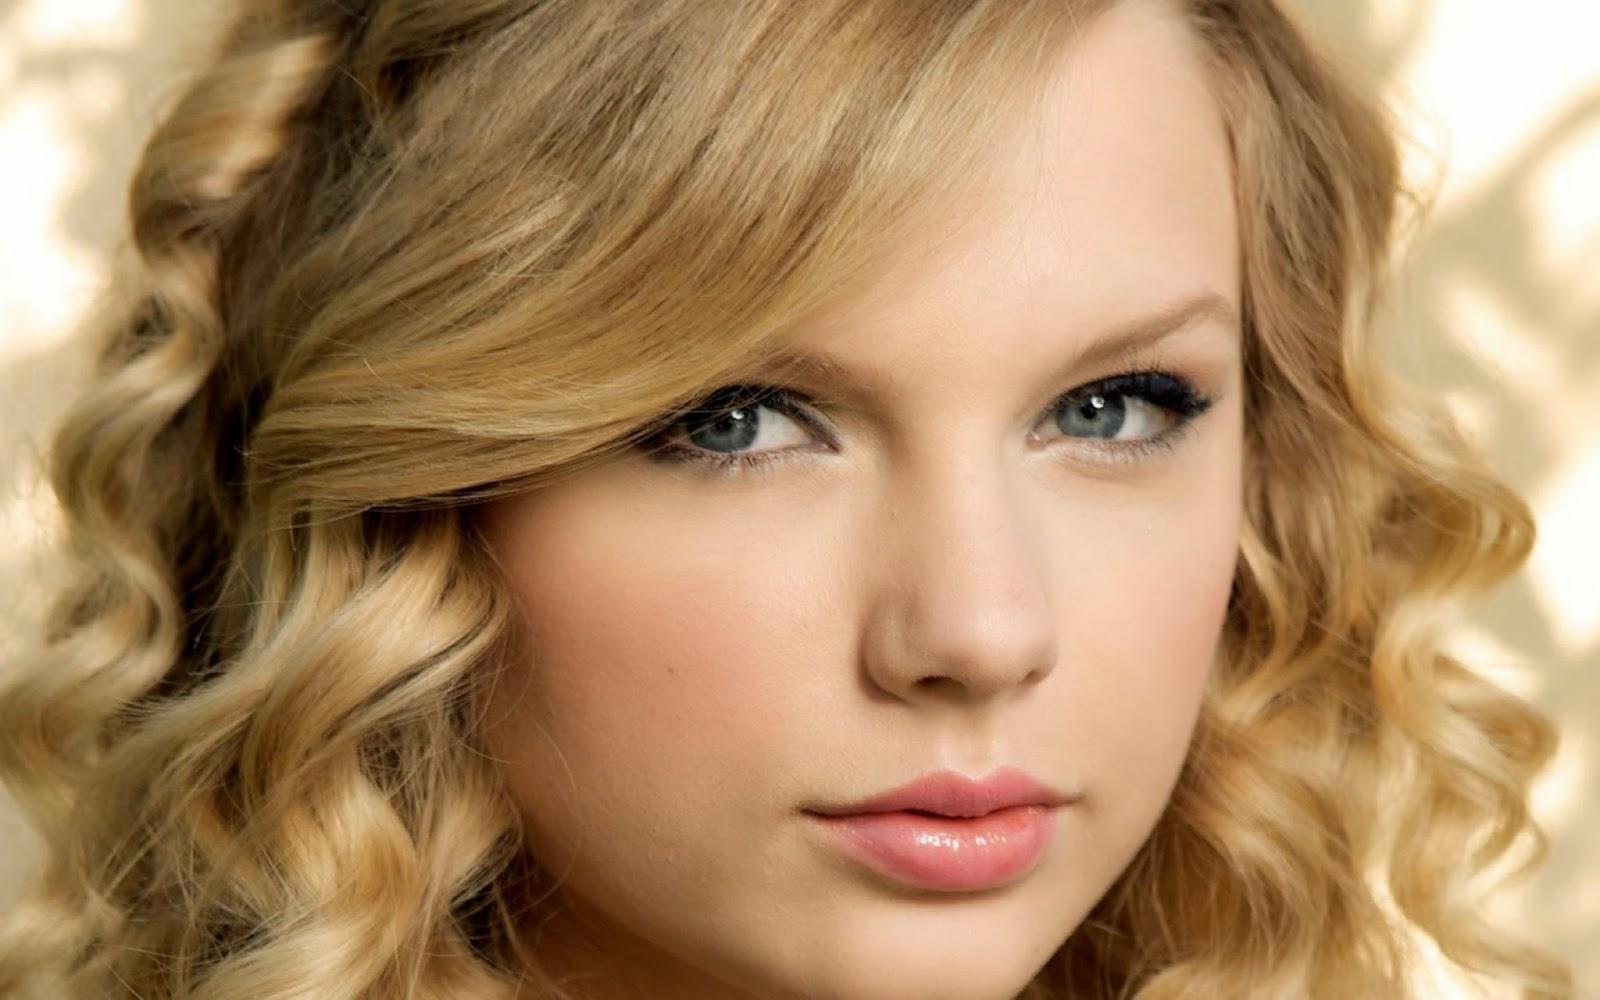 Tattoo Girl Hd Wallpaper Download Coogled Taylor Swift Cute Hd Wallpapers